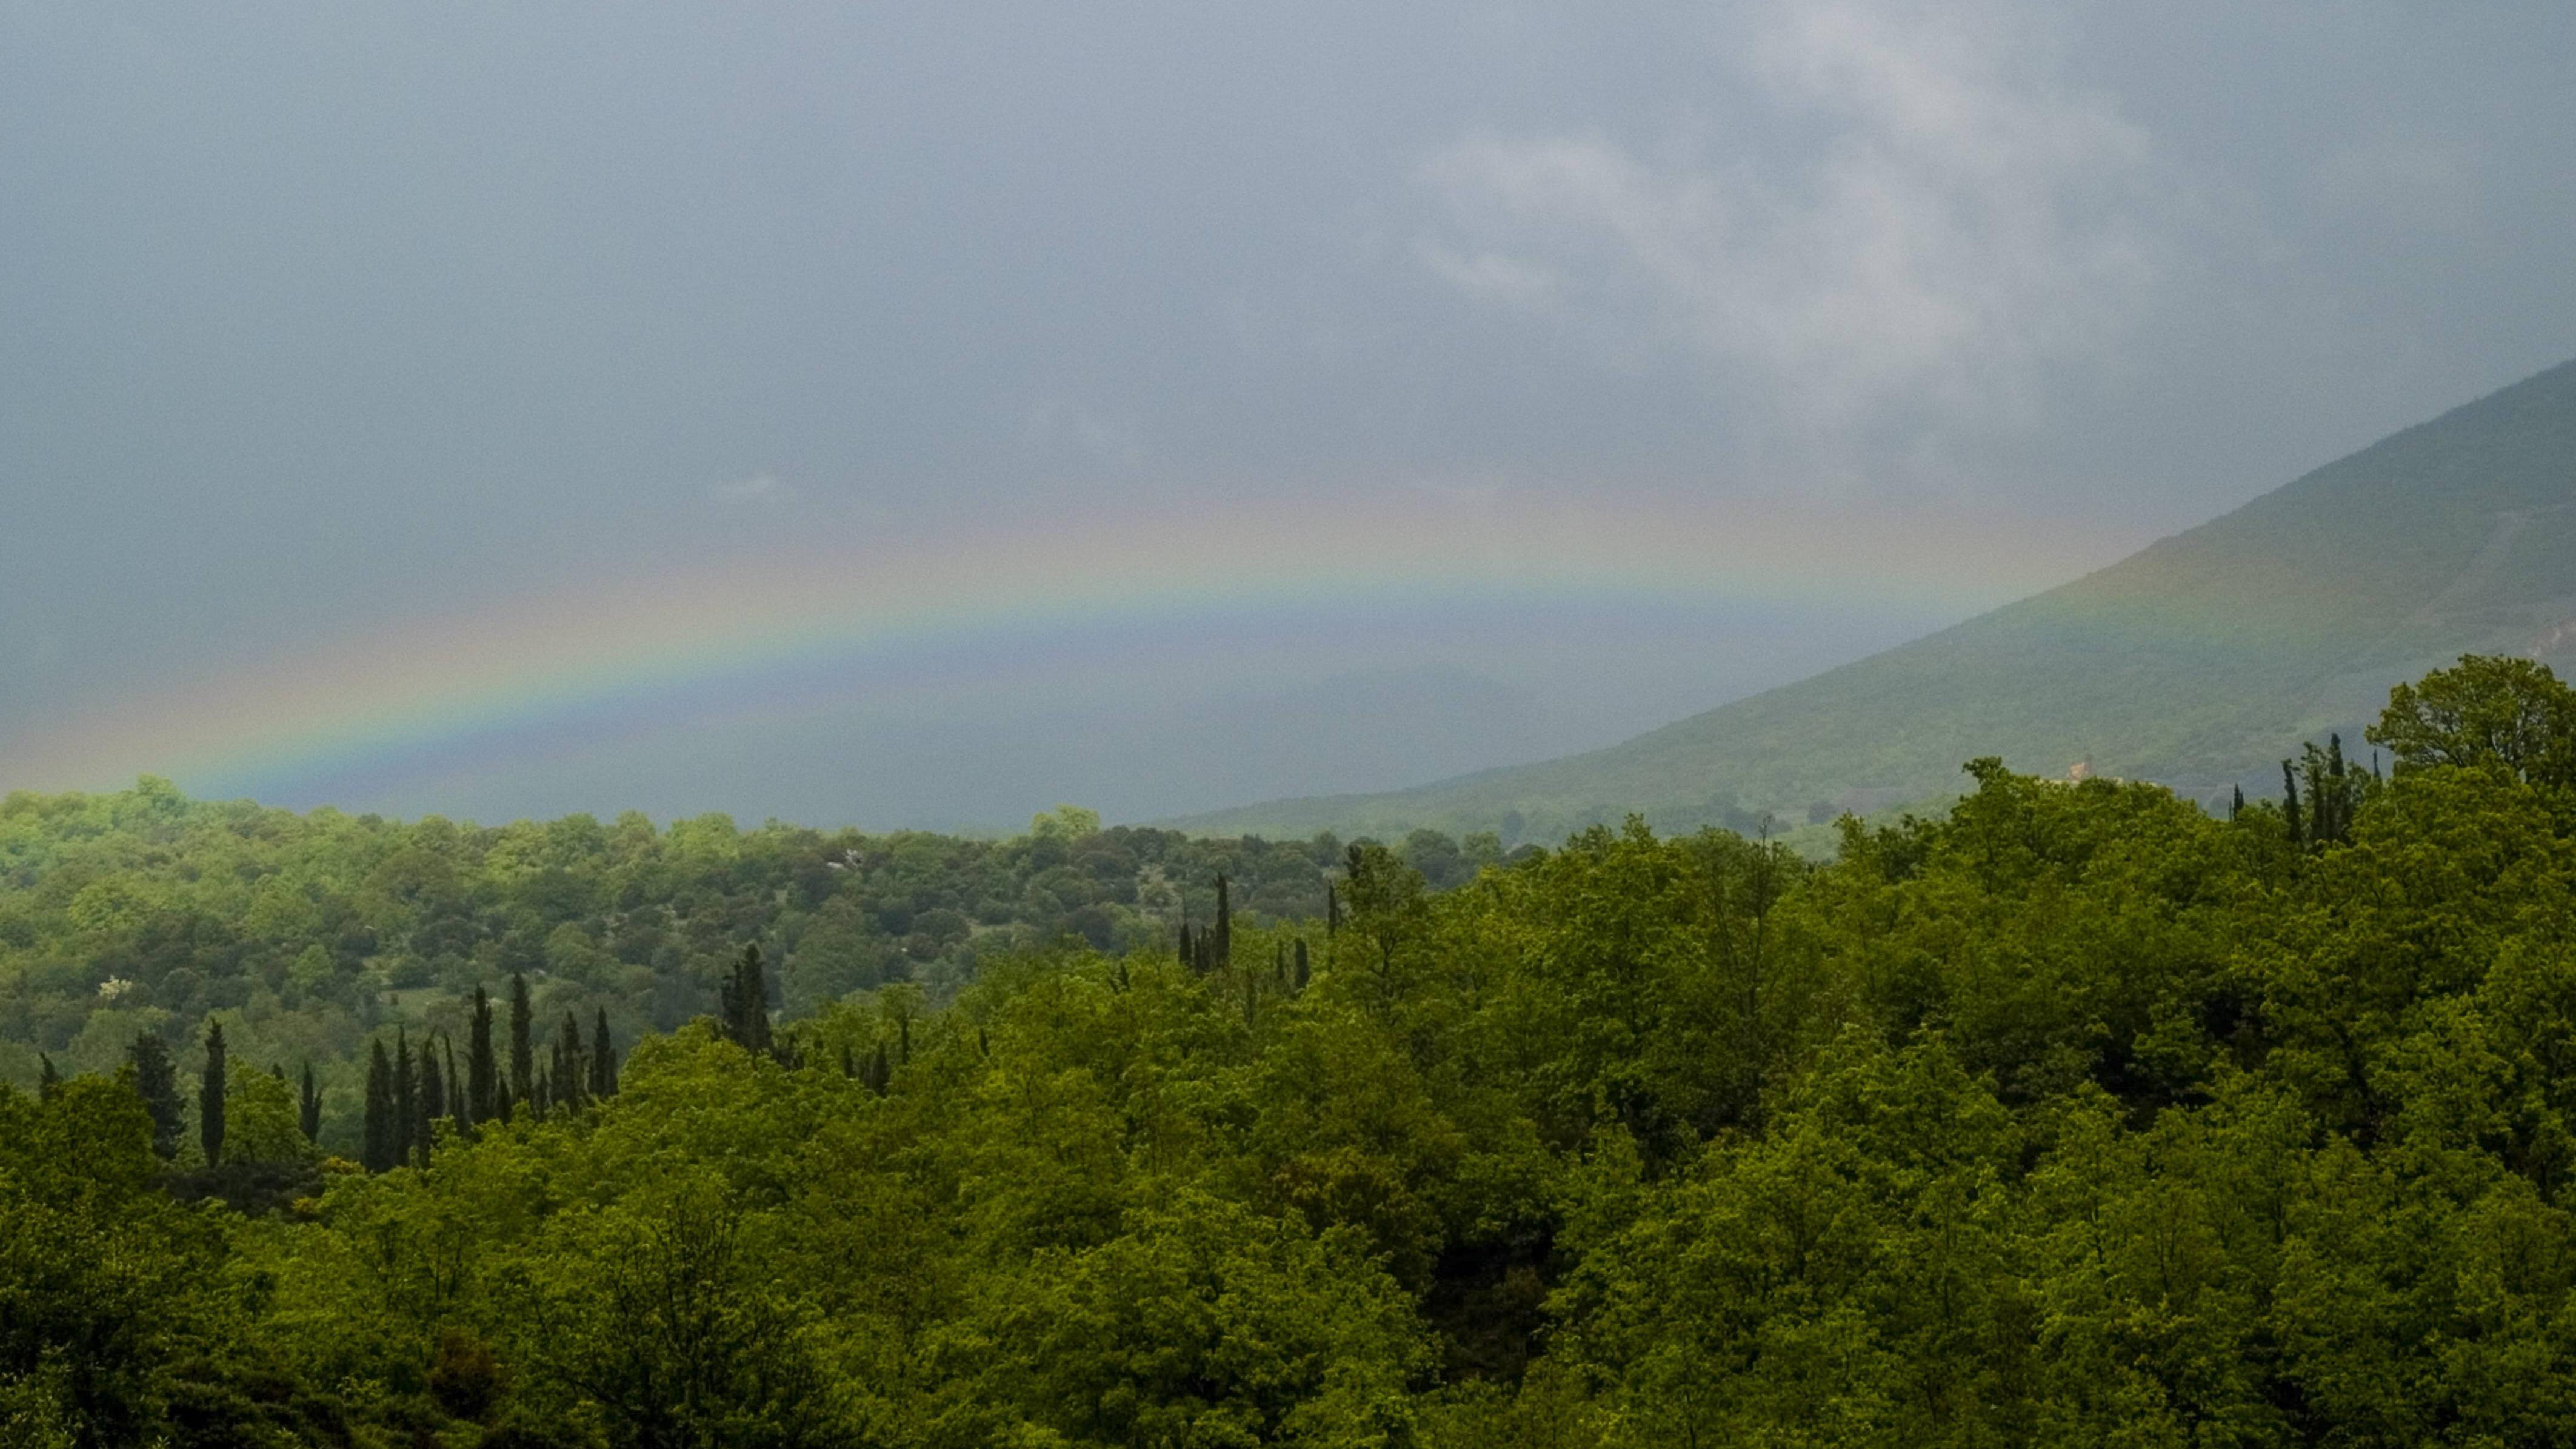 Regenbogen fotografieren: Die besten Tipps & Tricks